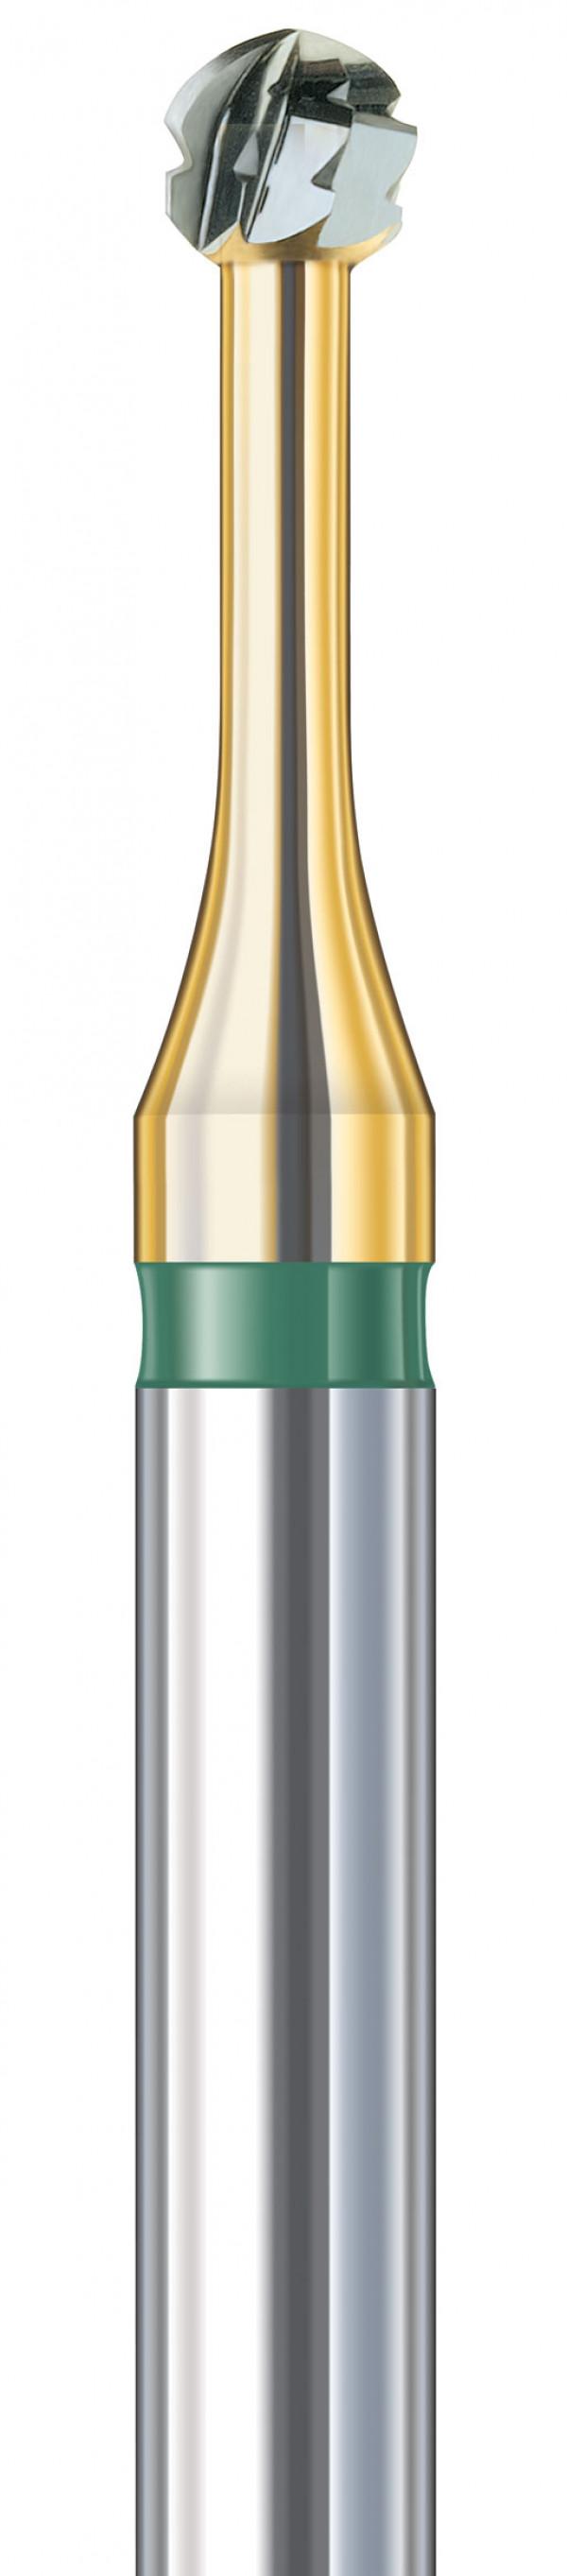 SXM-karbiditerä, pyöreä 021  2 kpl